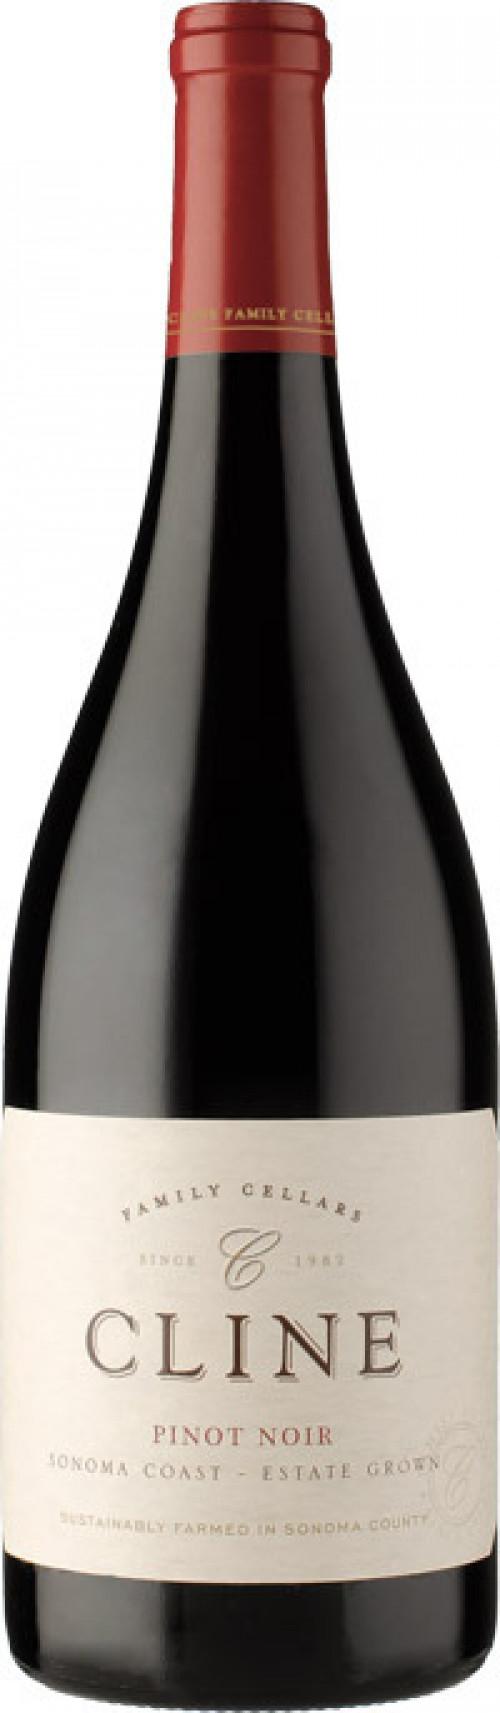 2019 Cline Sonoma County Pinot Noir 750ml